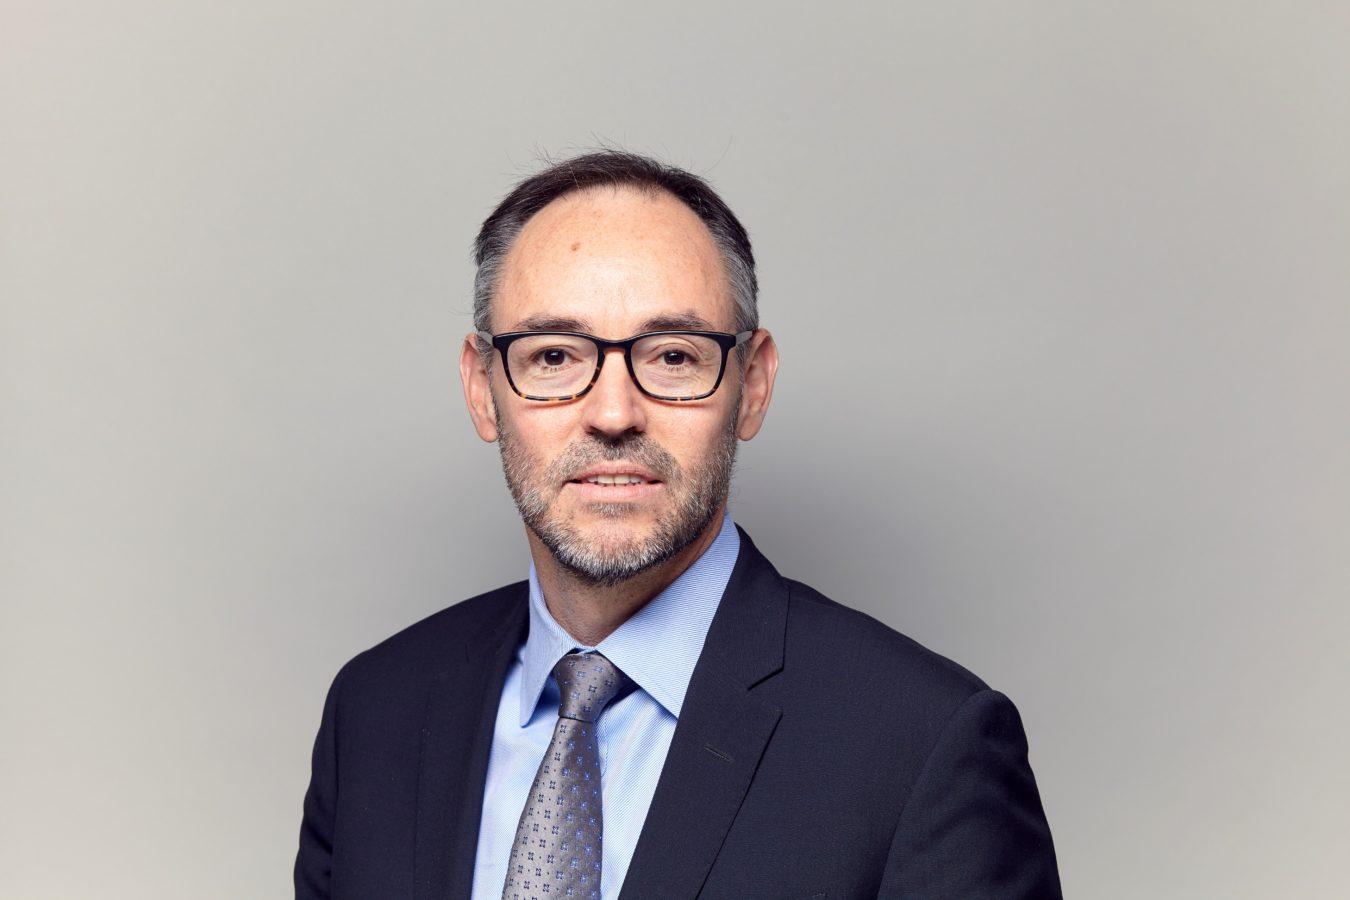 PGIM Fixed Income recrute un stratège en investissement international basé à Londres